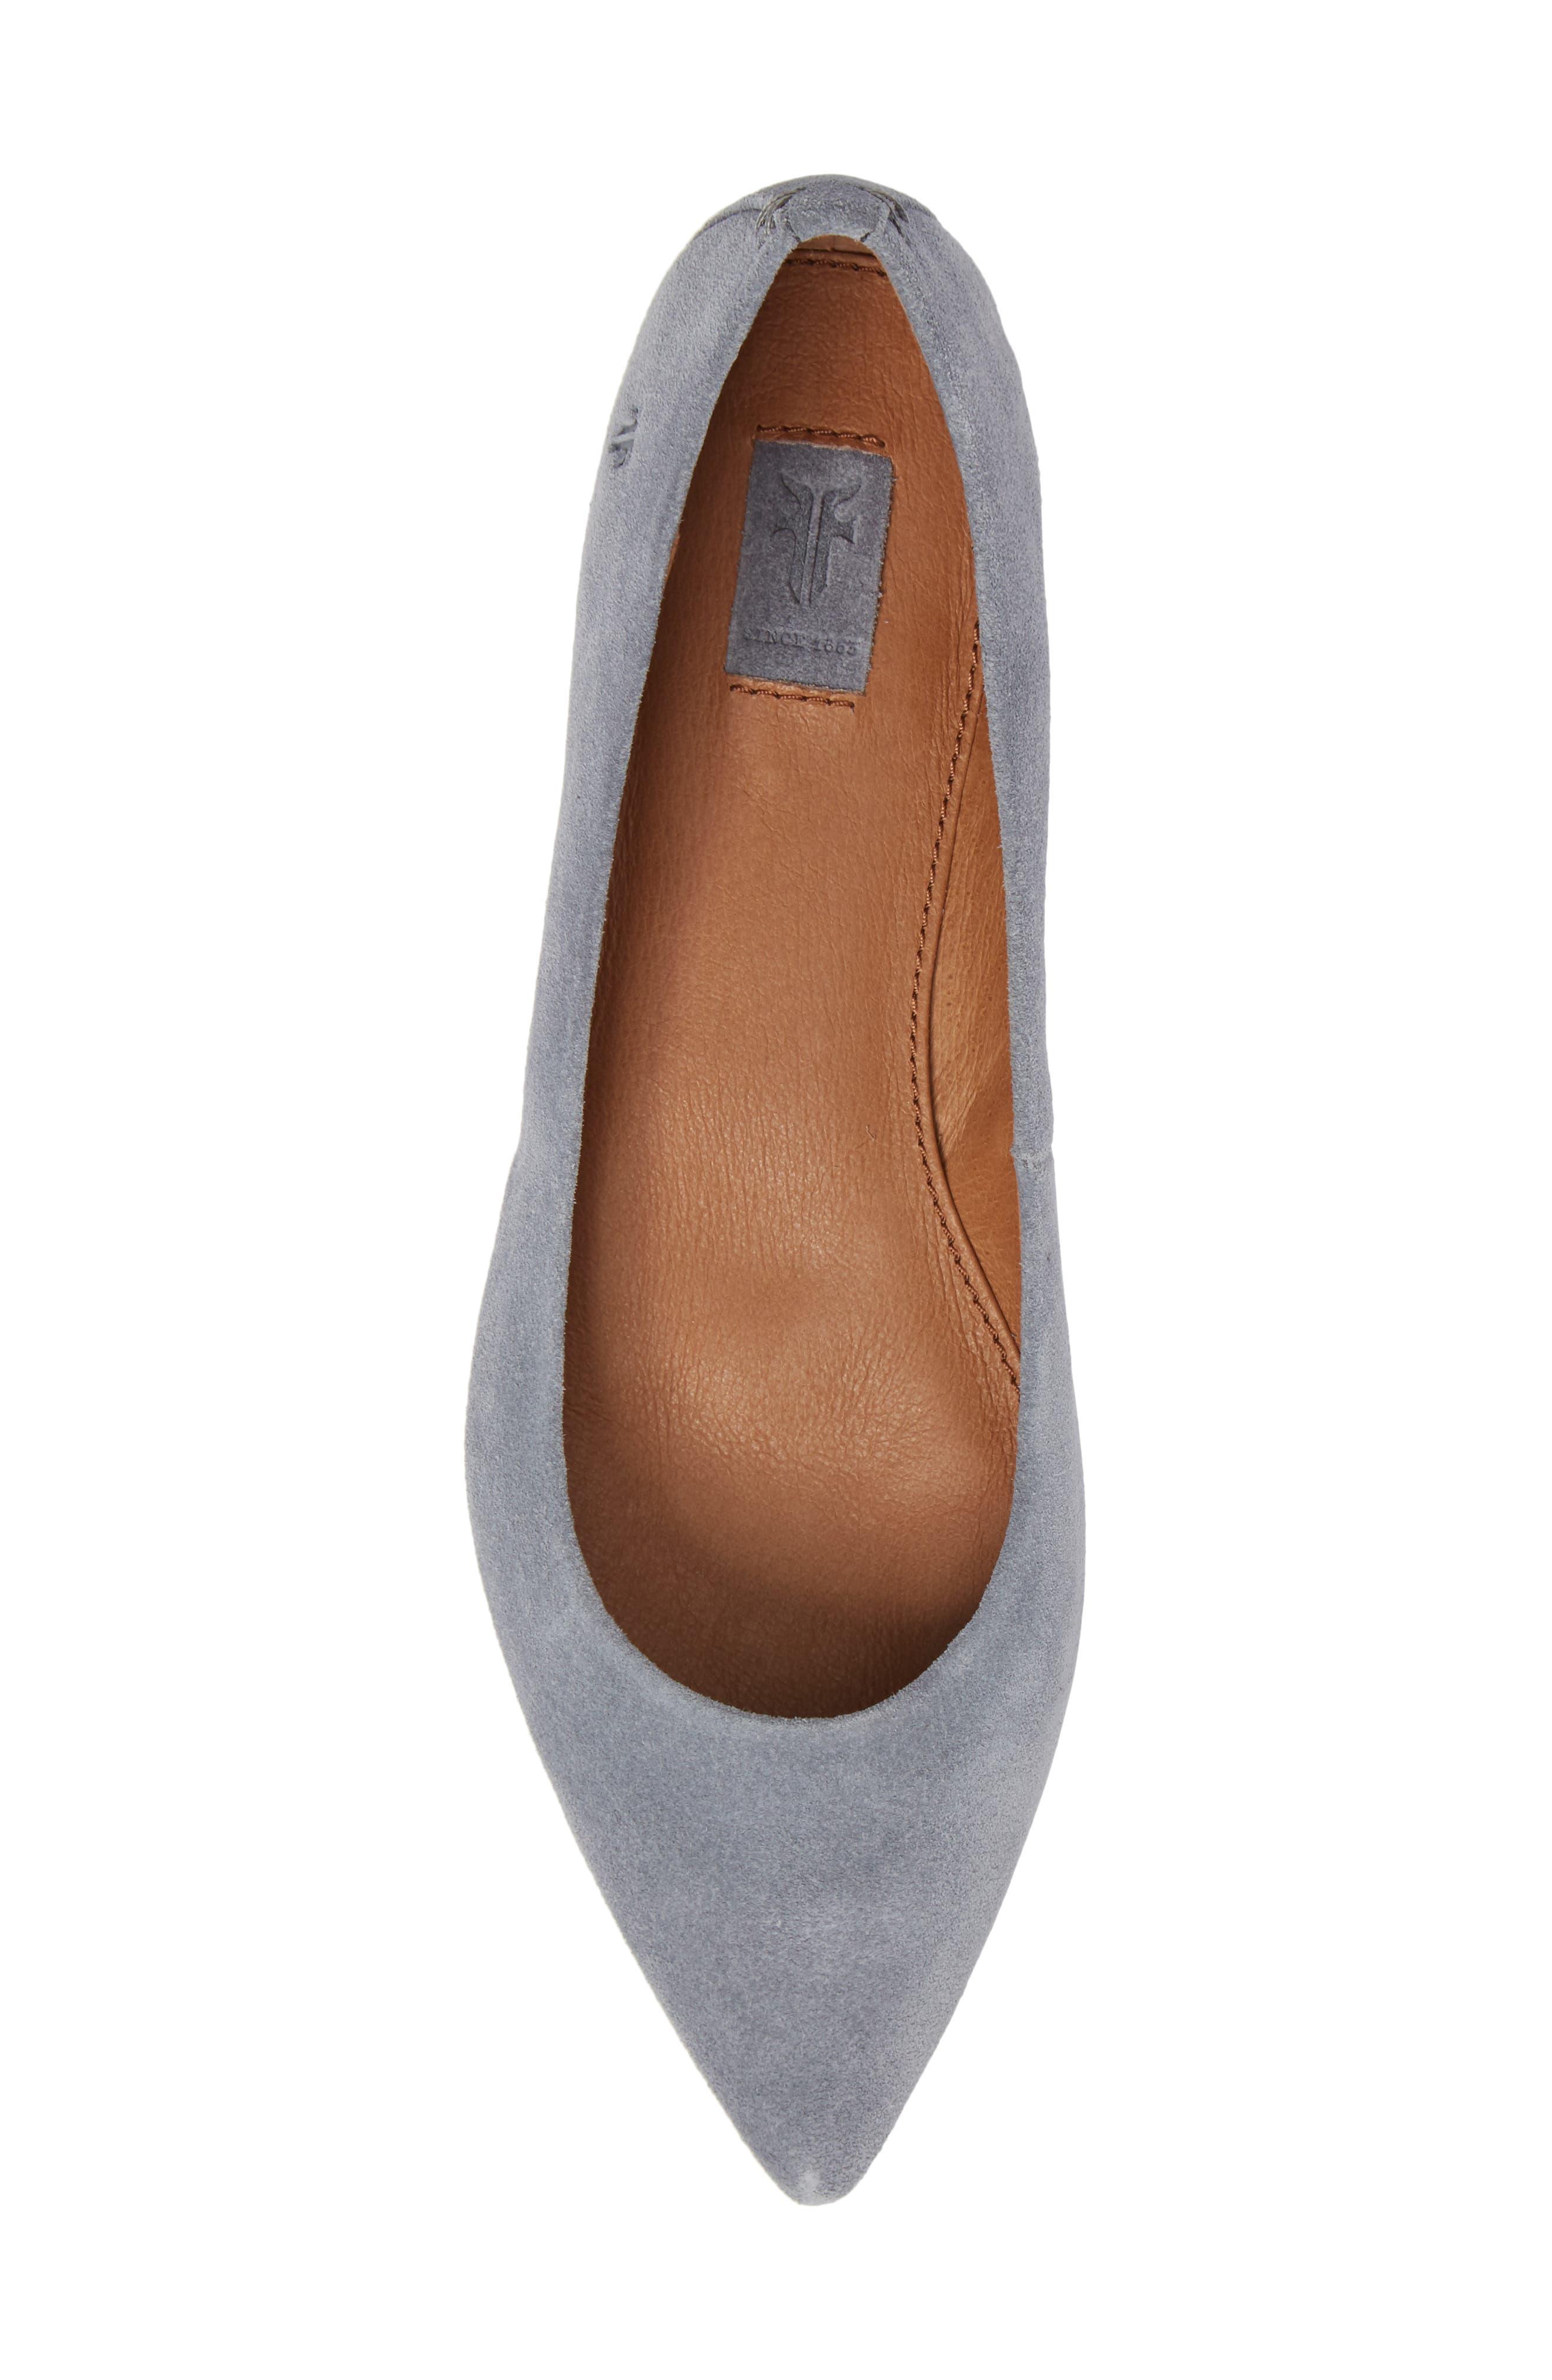 Sienna Pointy Toe Ballet Flat,                             Alternate thumbnail 15, color,